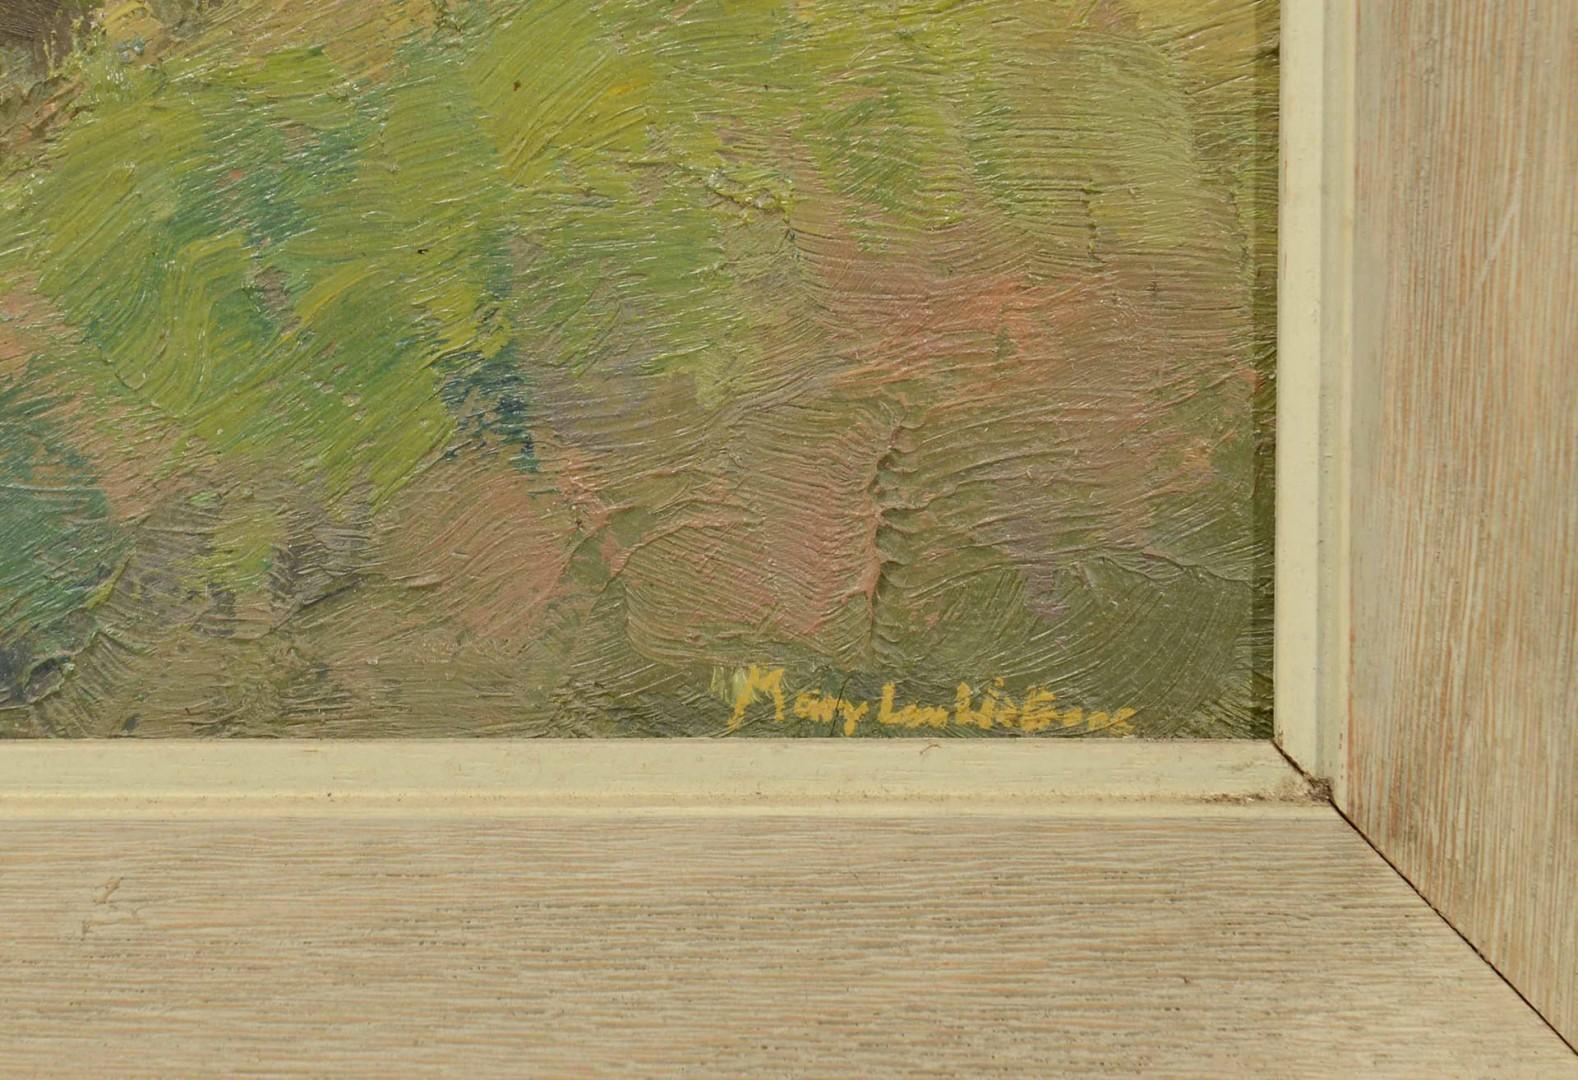 Lot 602: 3 Impressionist Painted Landscapes